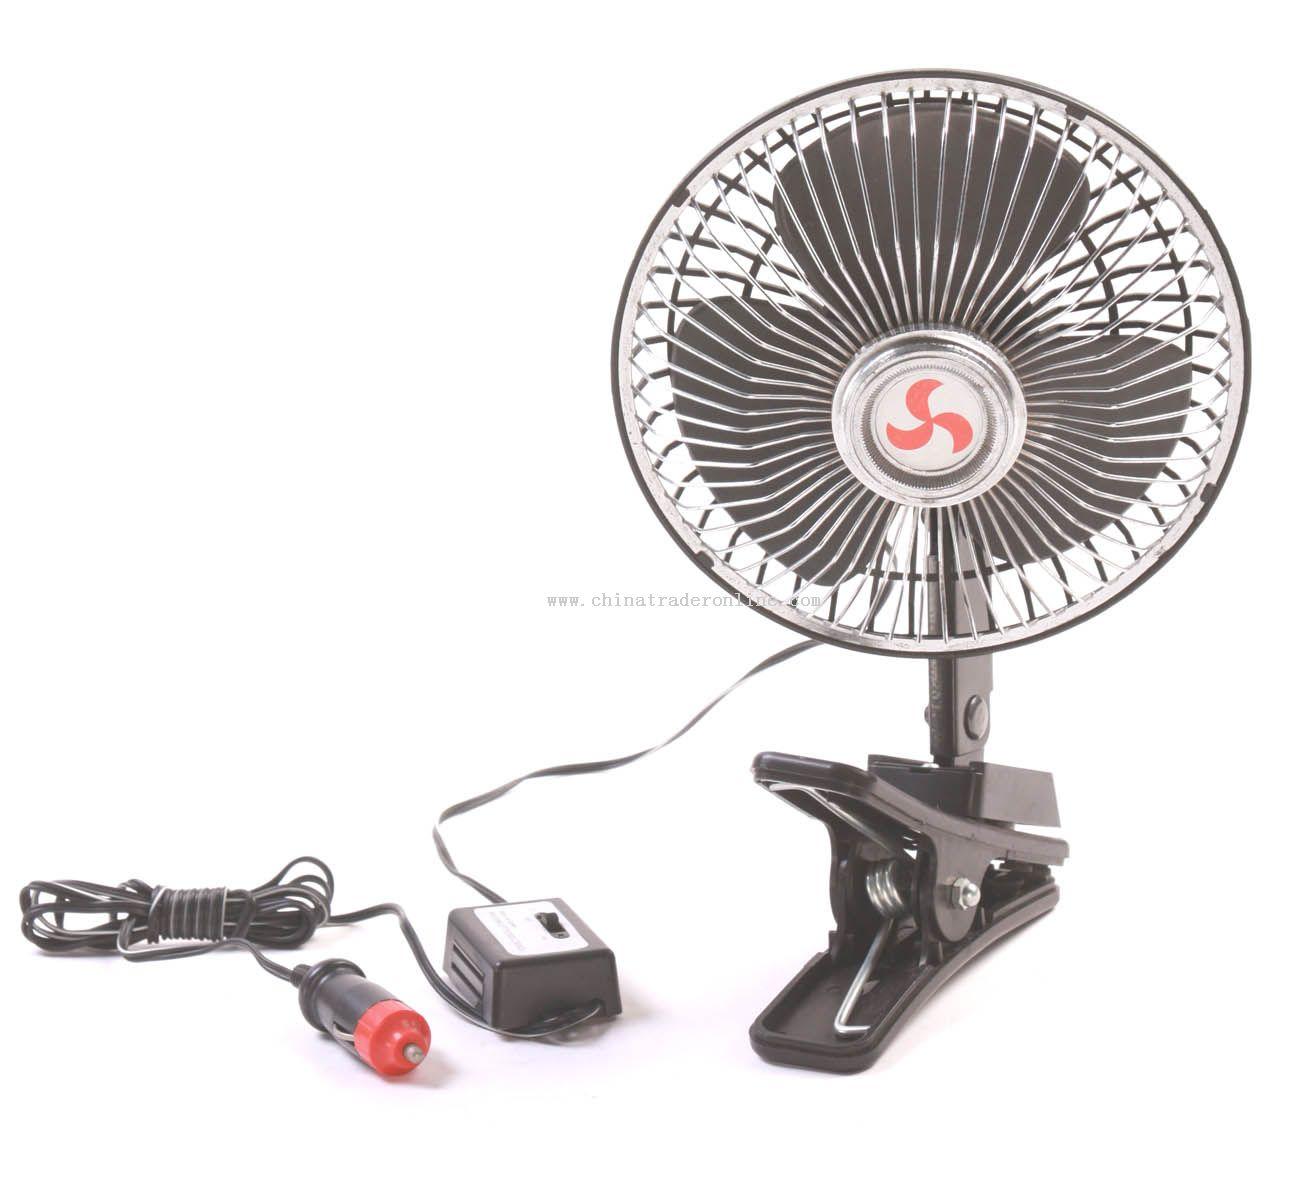 Wholesale Hi Power Turbo Fan Buy Discount Hi Power Turbo